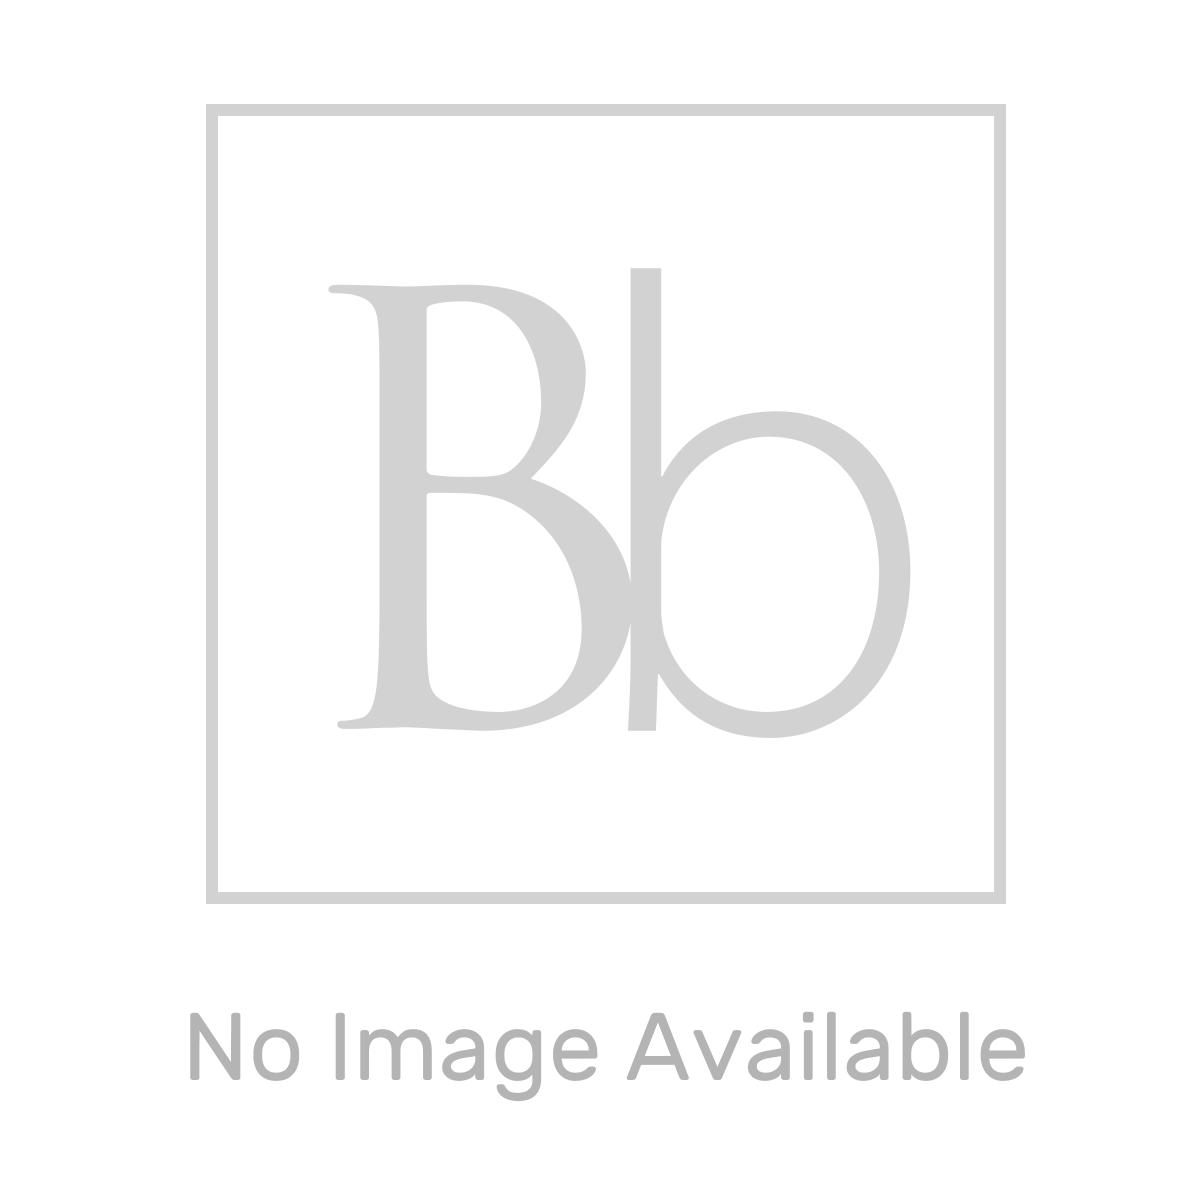 McAlpine HC2650UK-FIL Chrome Plated Brass Bath Filler and Overflow